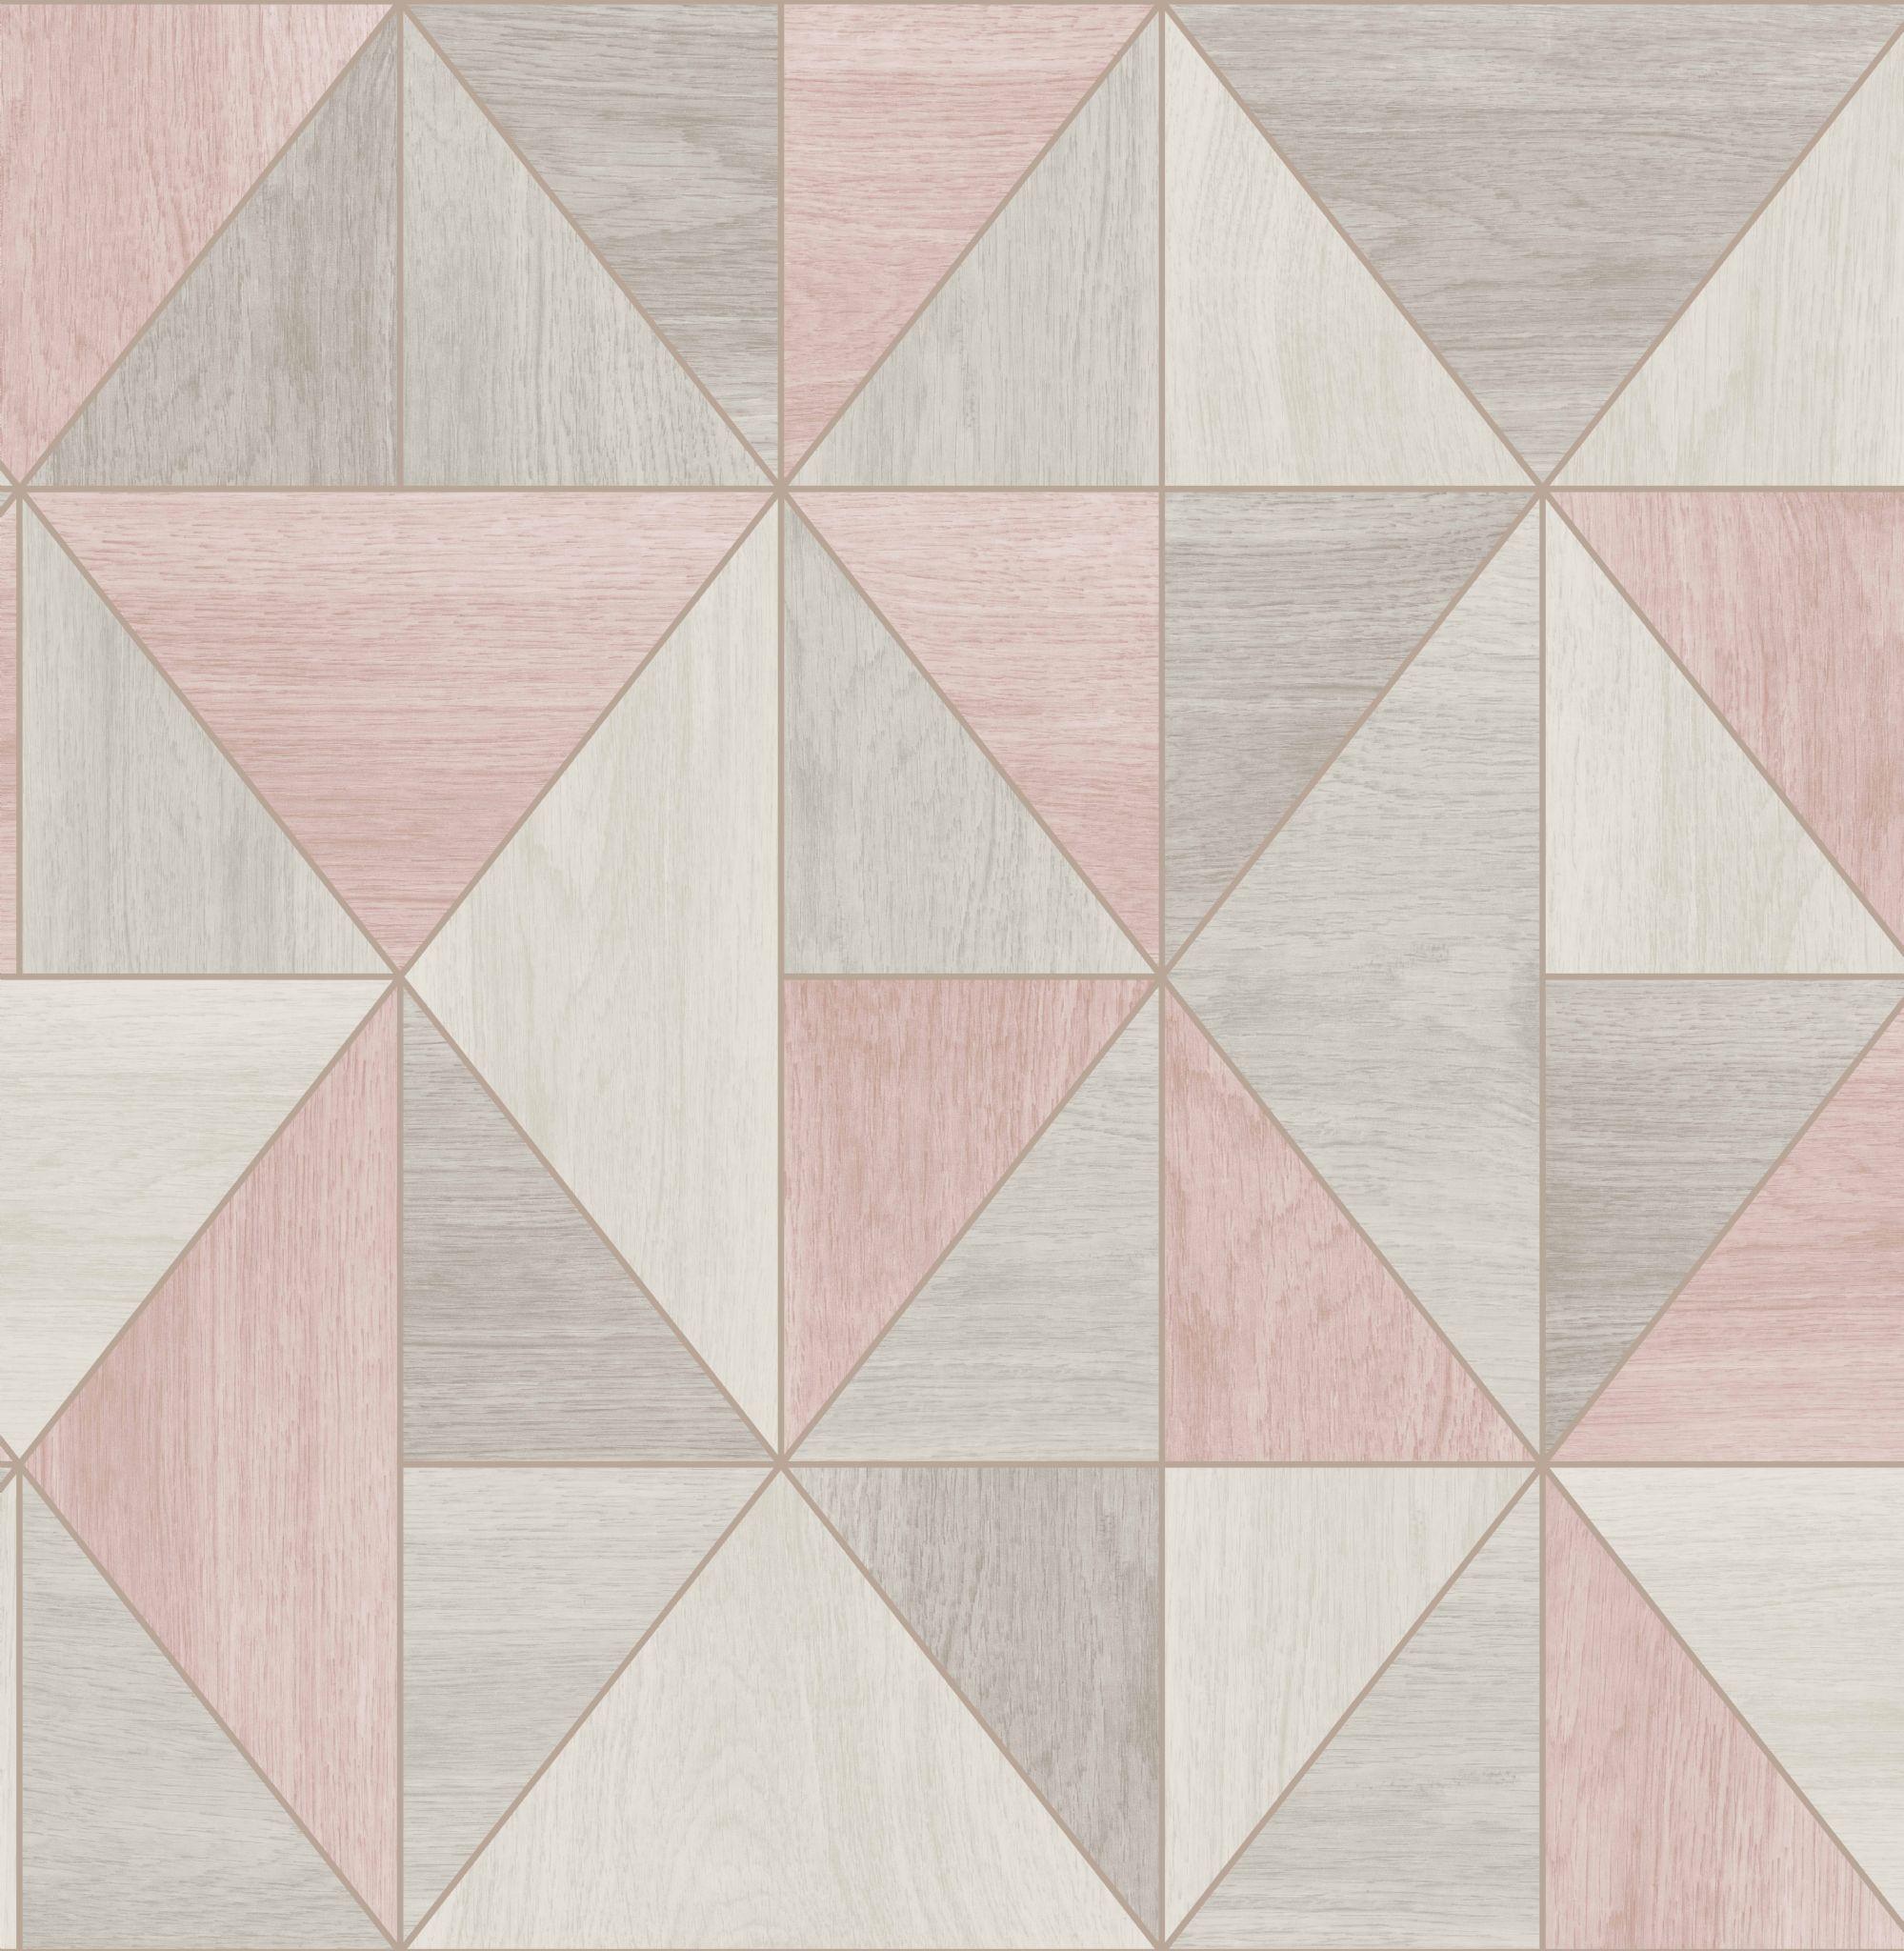 Apex Geo Wallpaper Rose Gold: Fine Decor Apex Wood Grain Rose Gold FD42224 Wallpaper